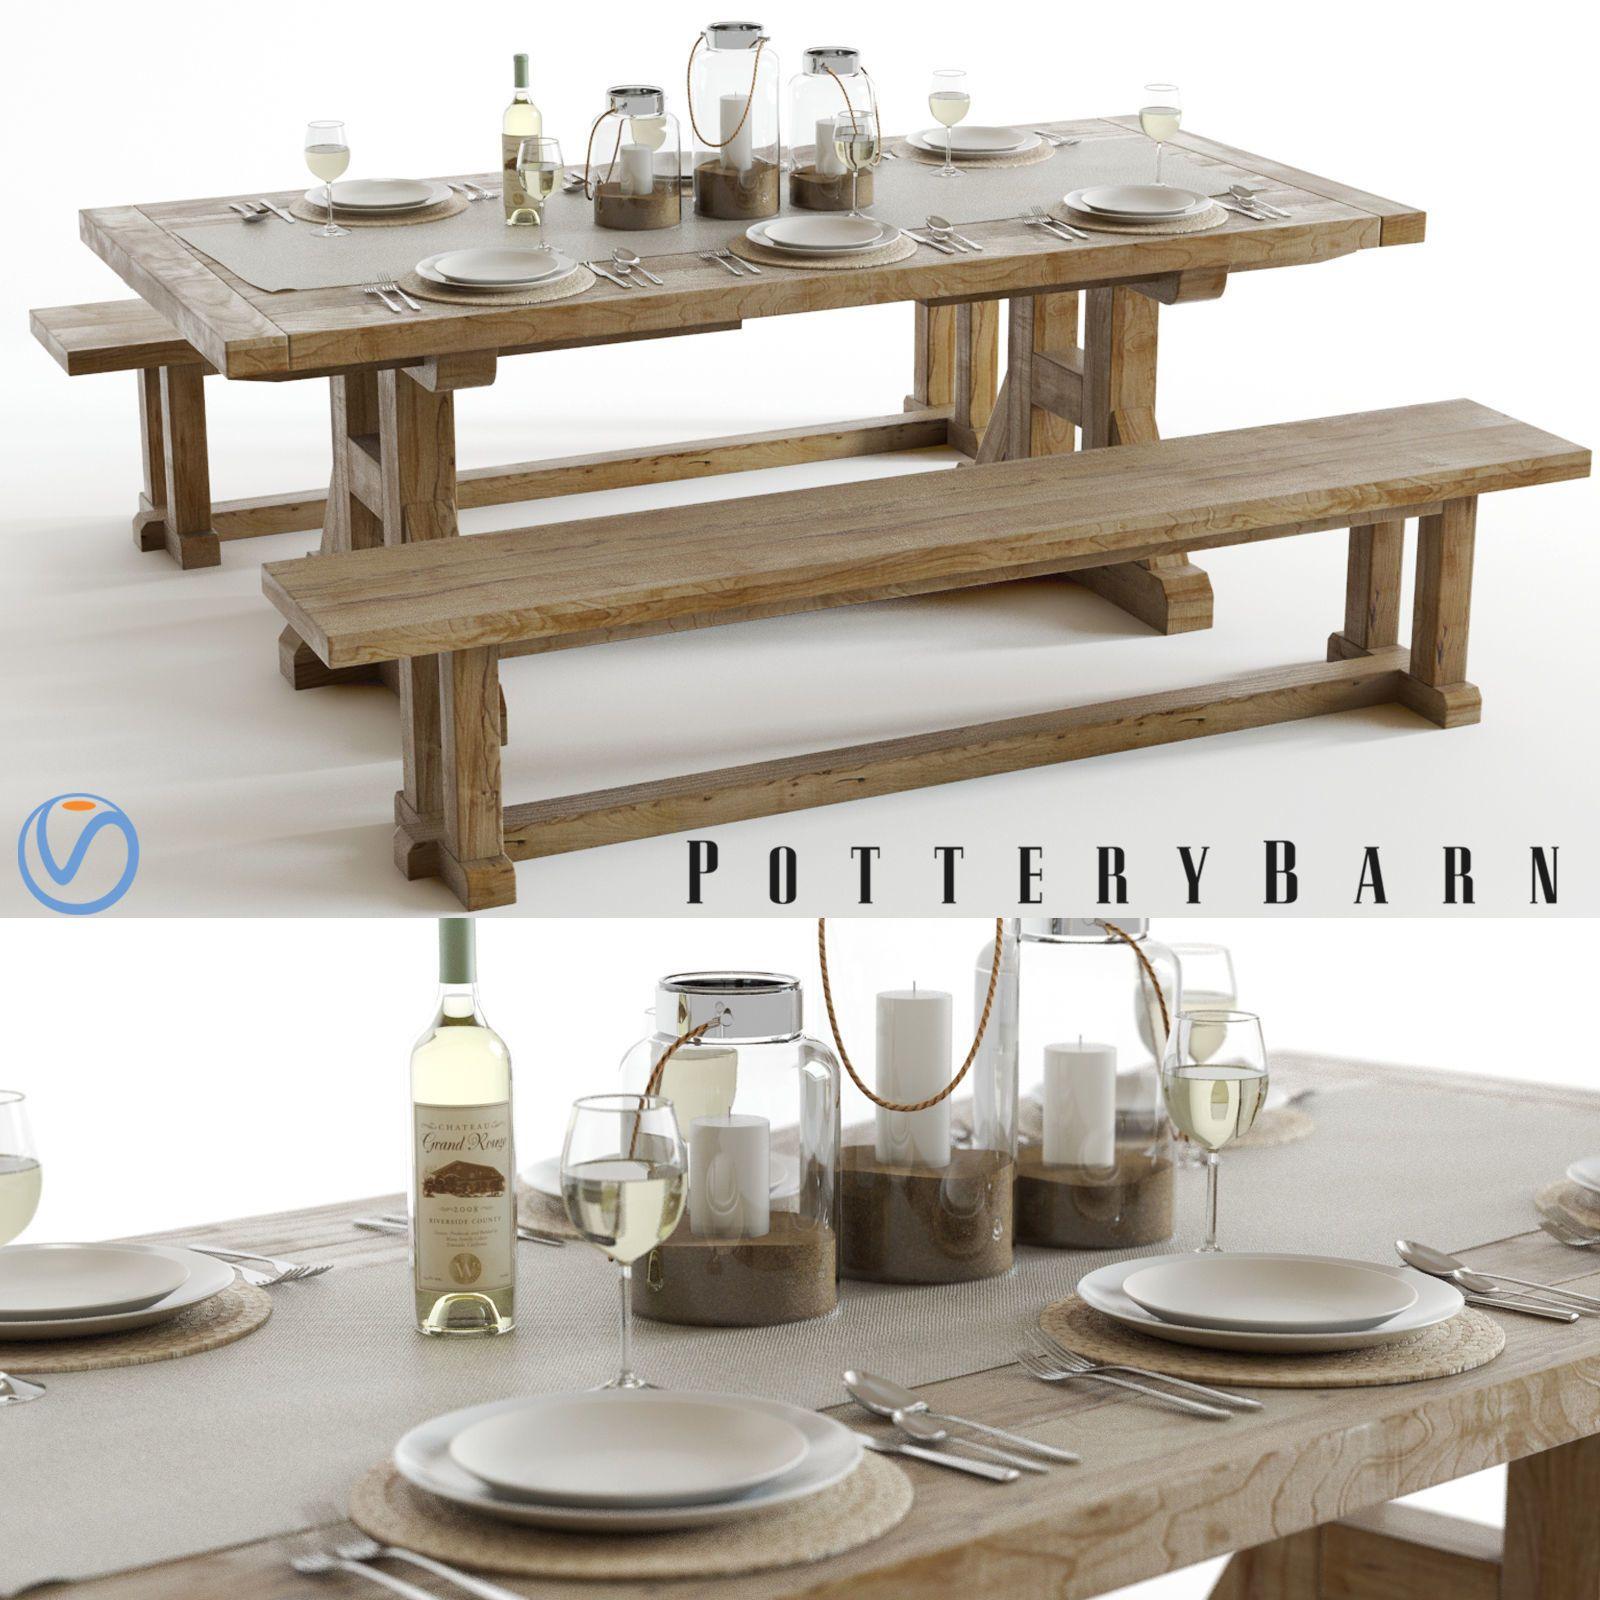 pottery barn stafford dining set 3d model max obj fbx mtl